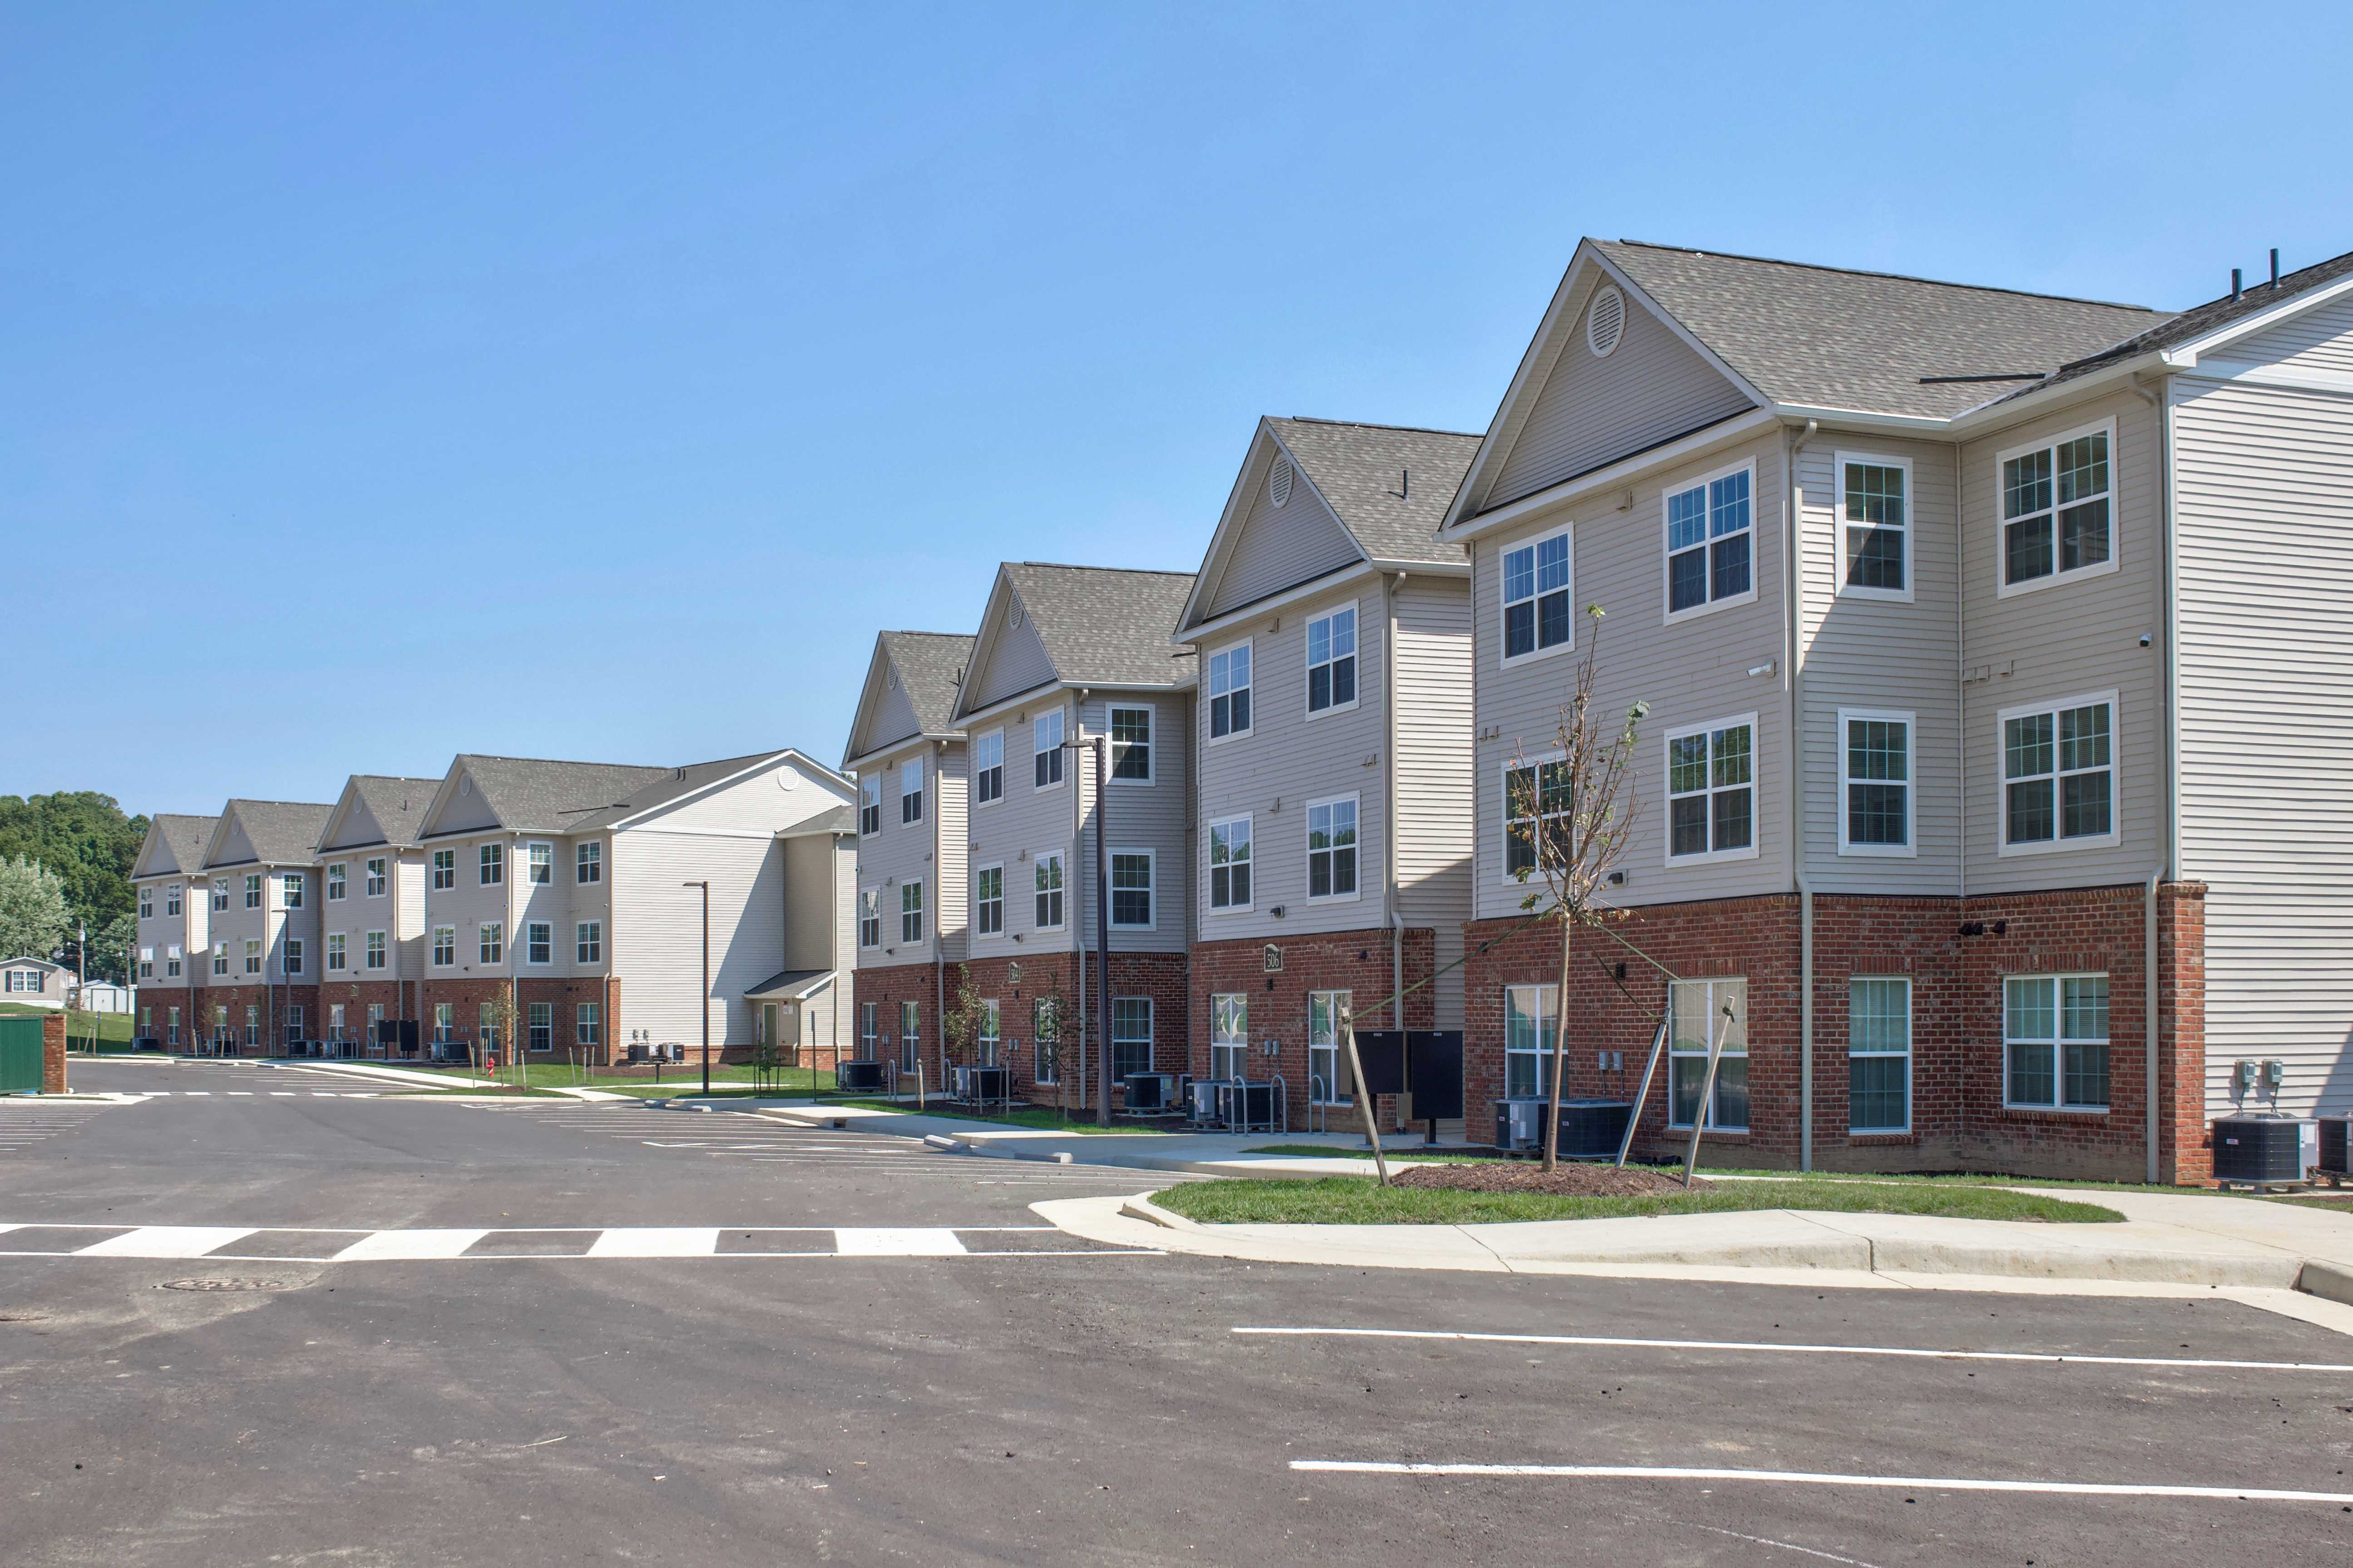 Image of Fieldstone Apartments